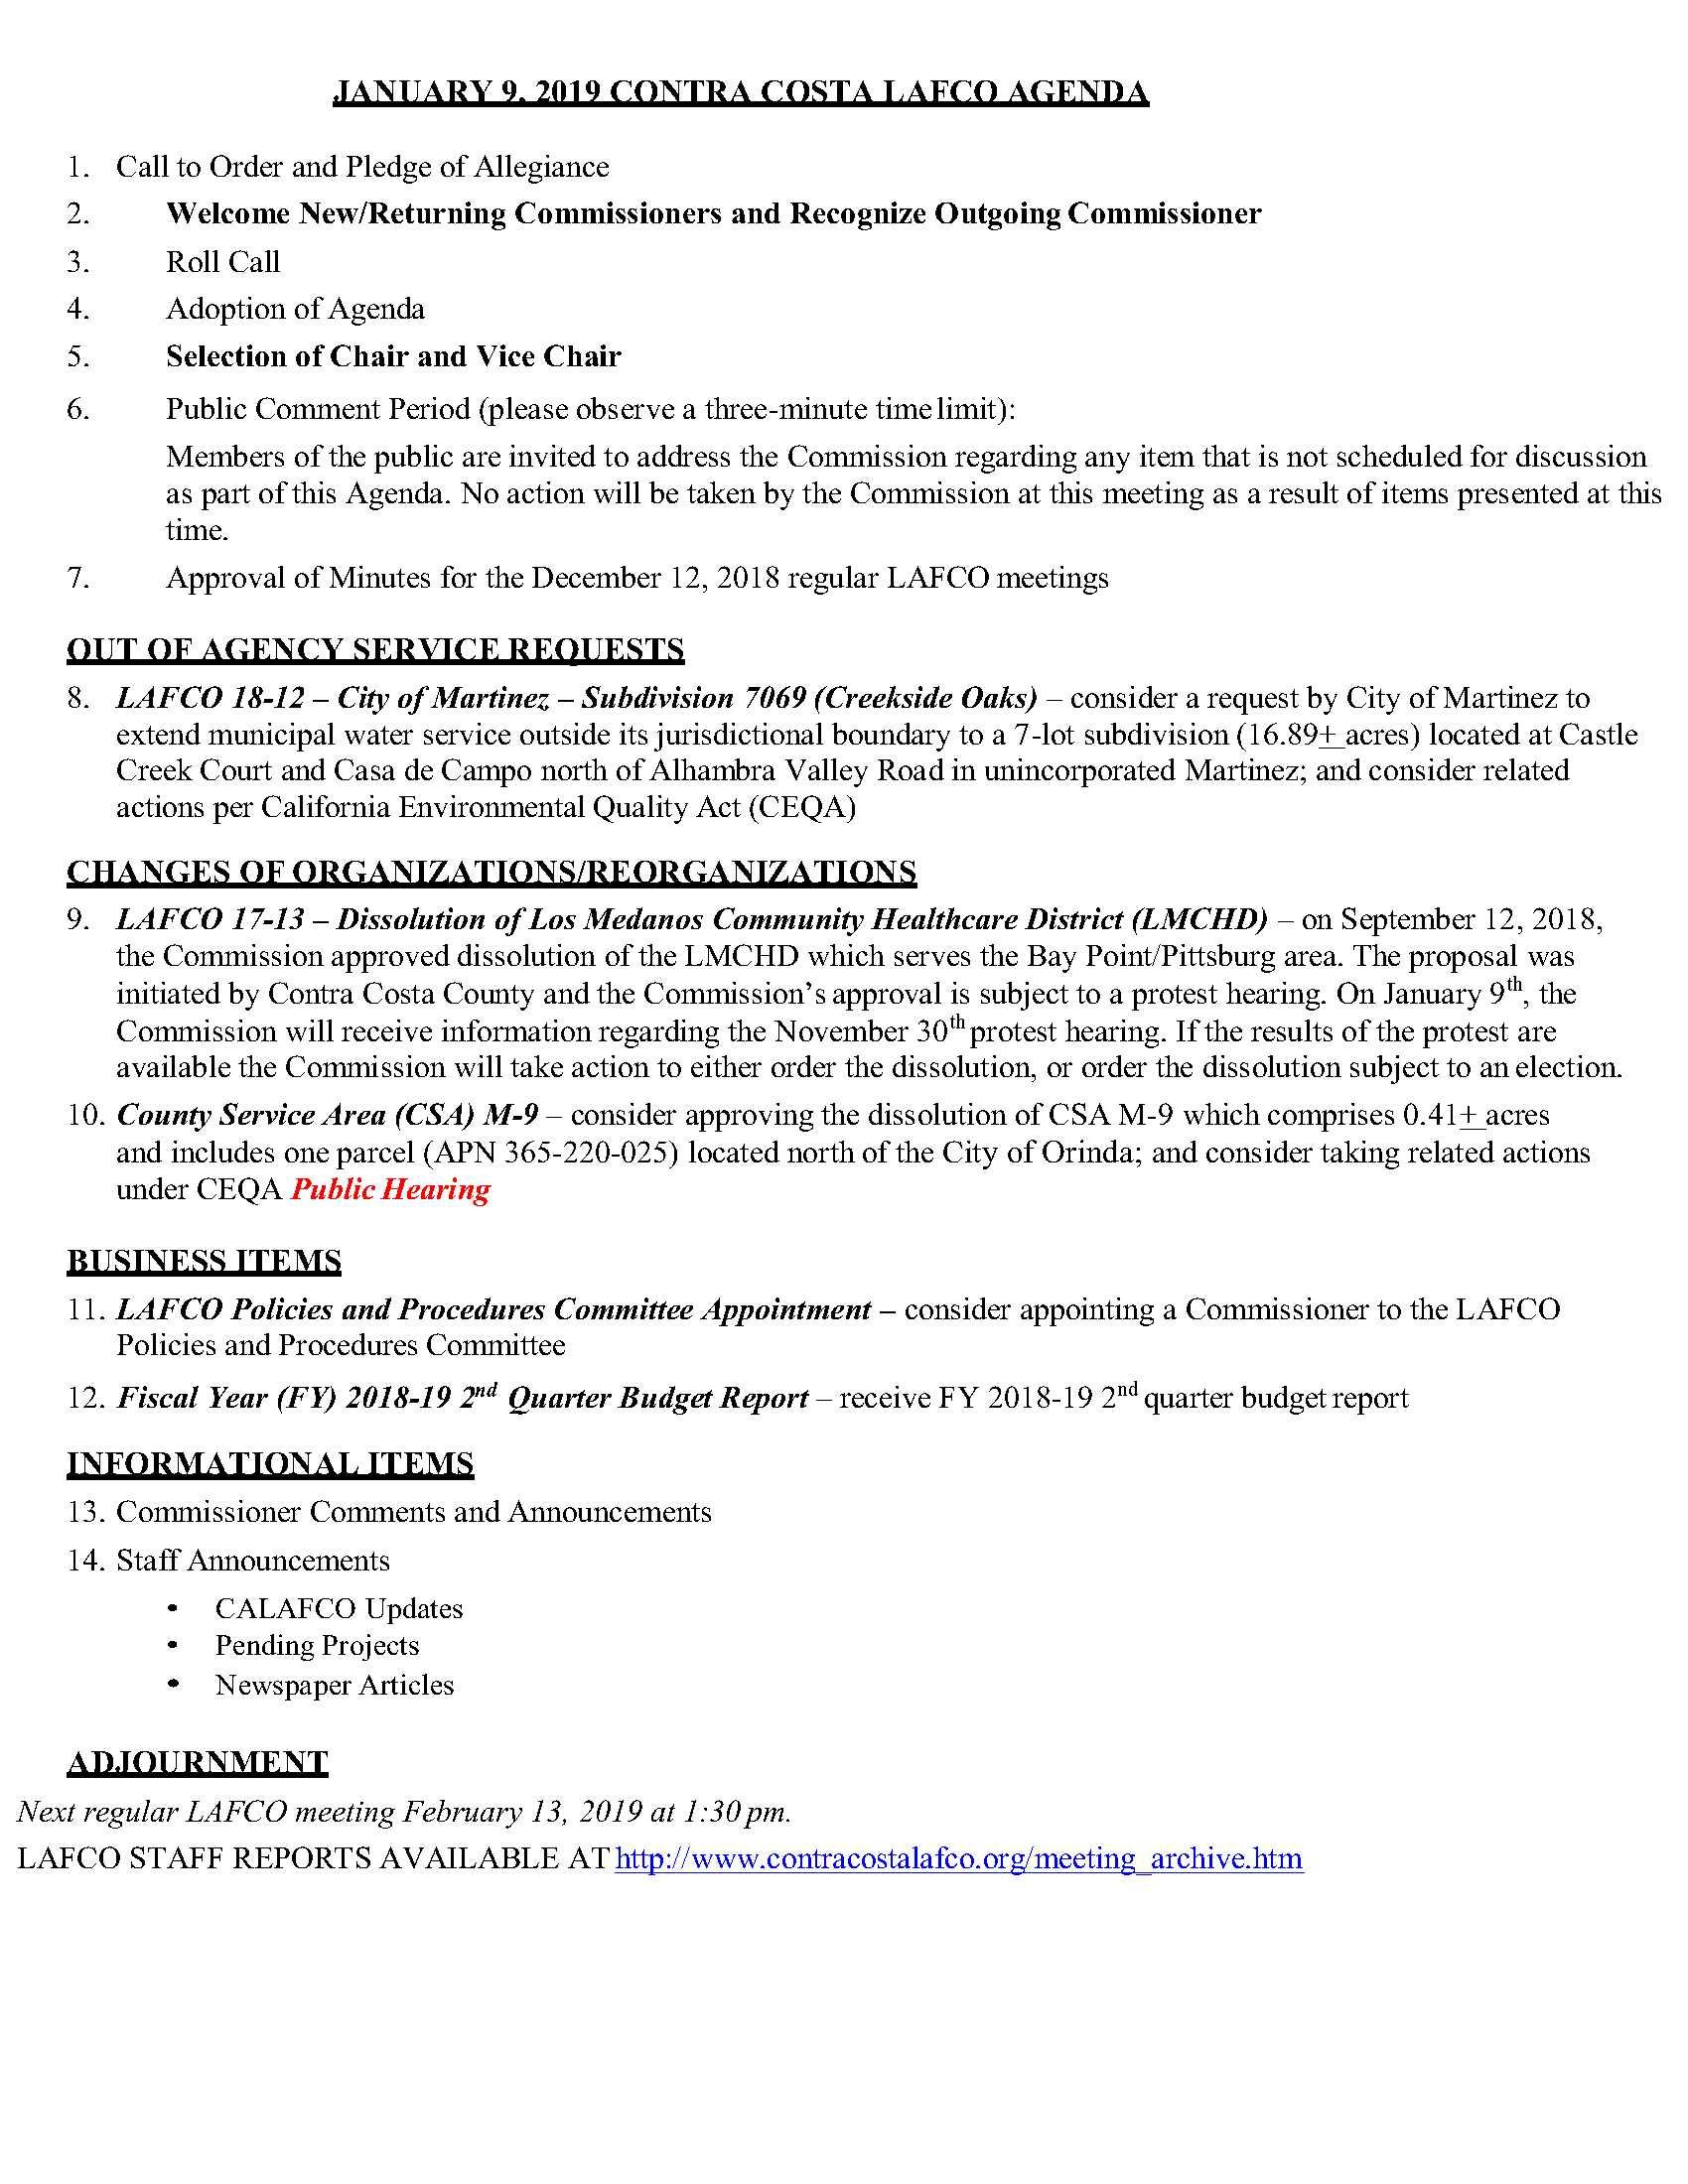 ESMAC Agenda 1.9.2019 (34 Pages)_14.jpg